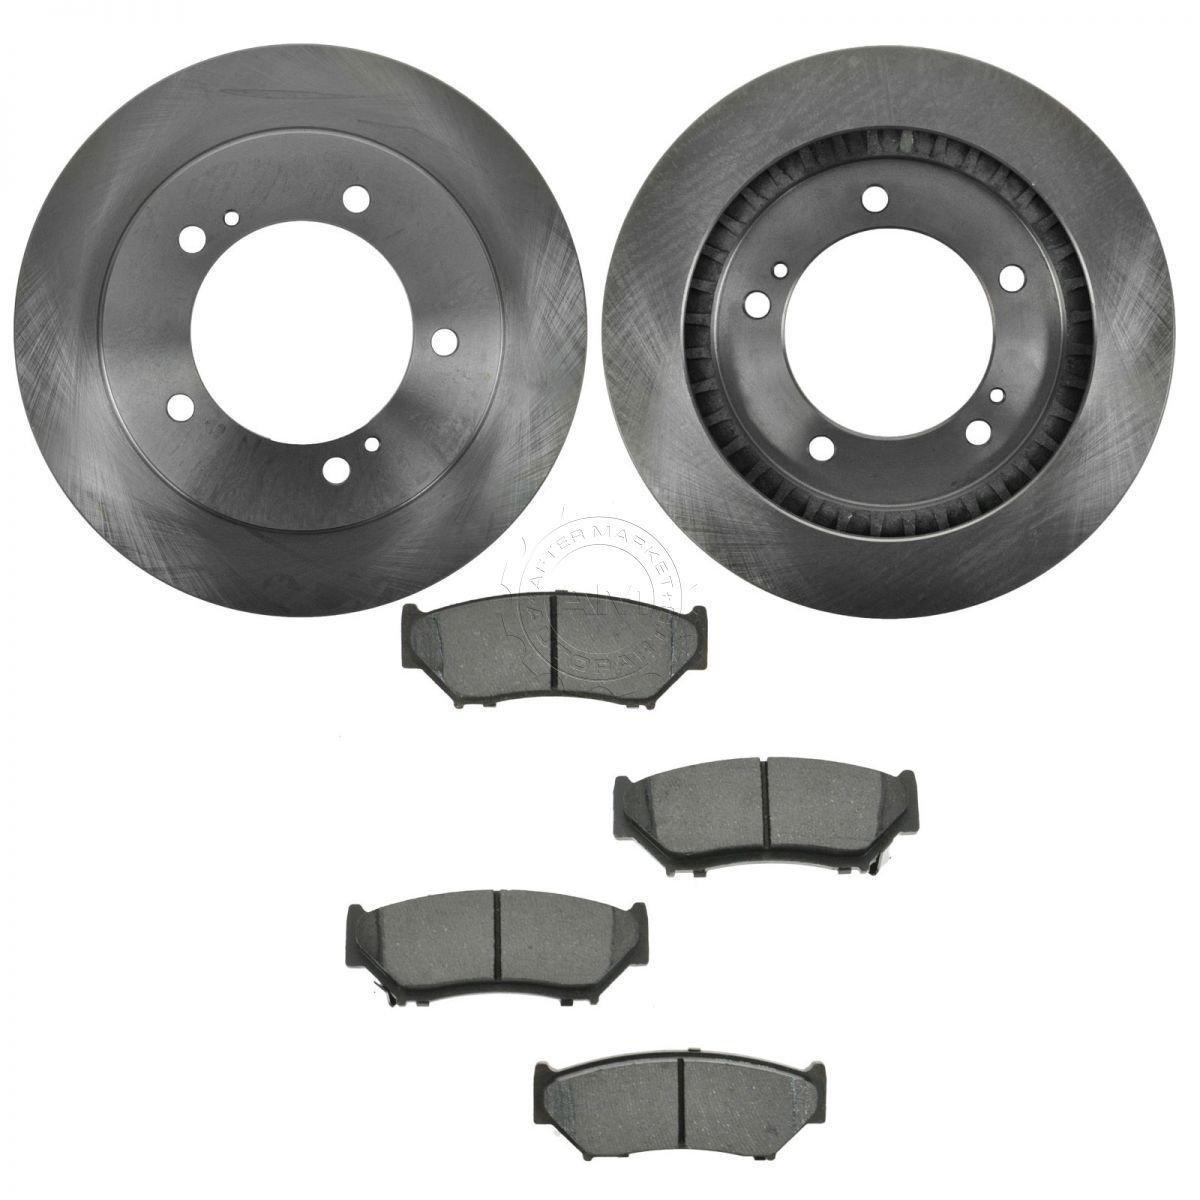 Brake Rotor Material : Nakamoto front brake rotors semi metallic pad kit set